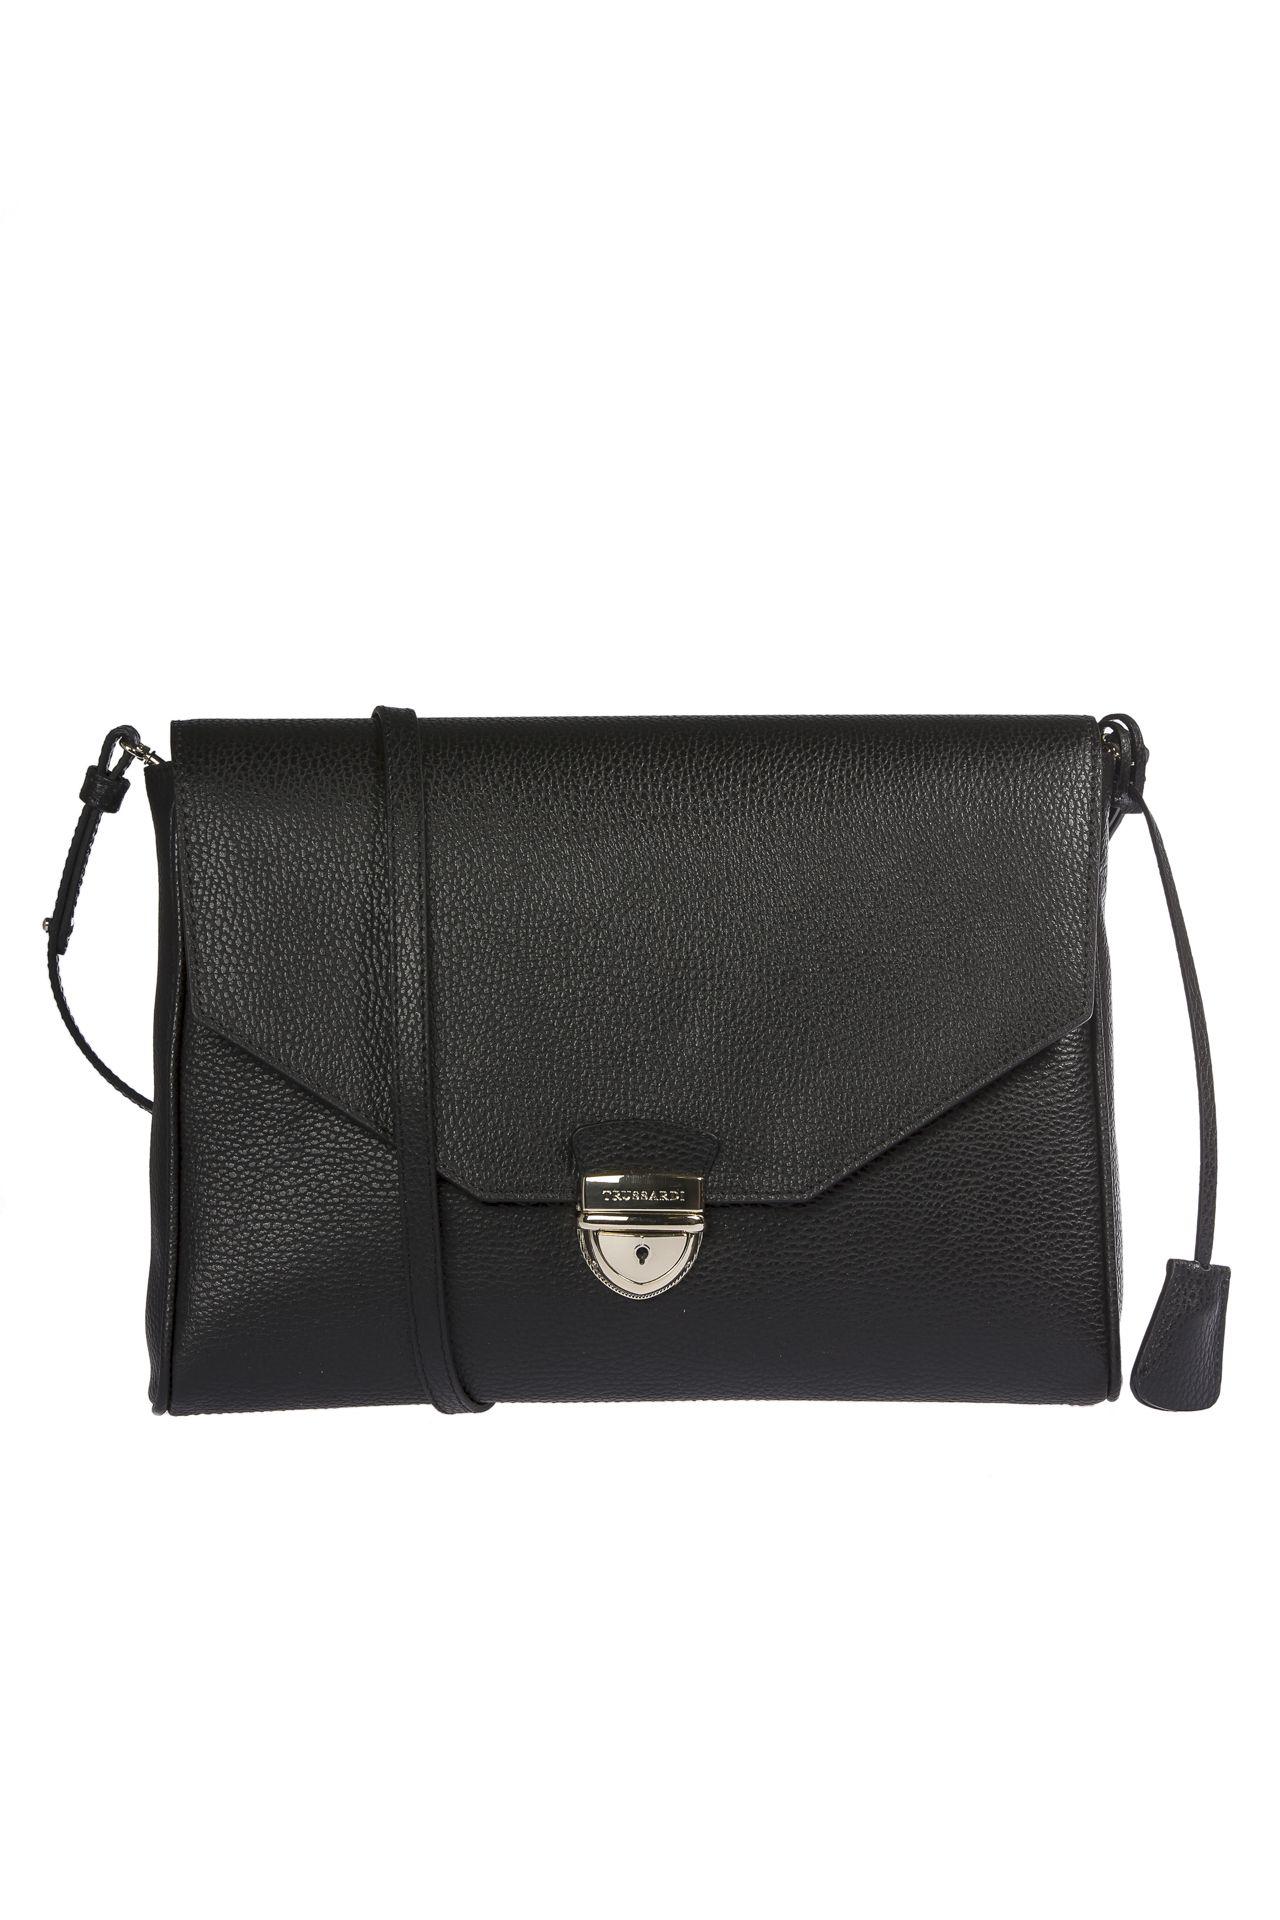 Trussardi Women's Crossbody Bag Brown 1DB435_19Black